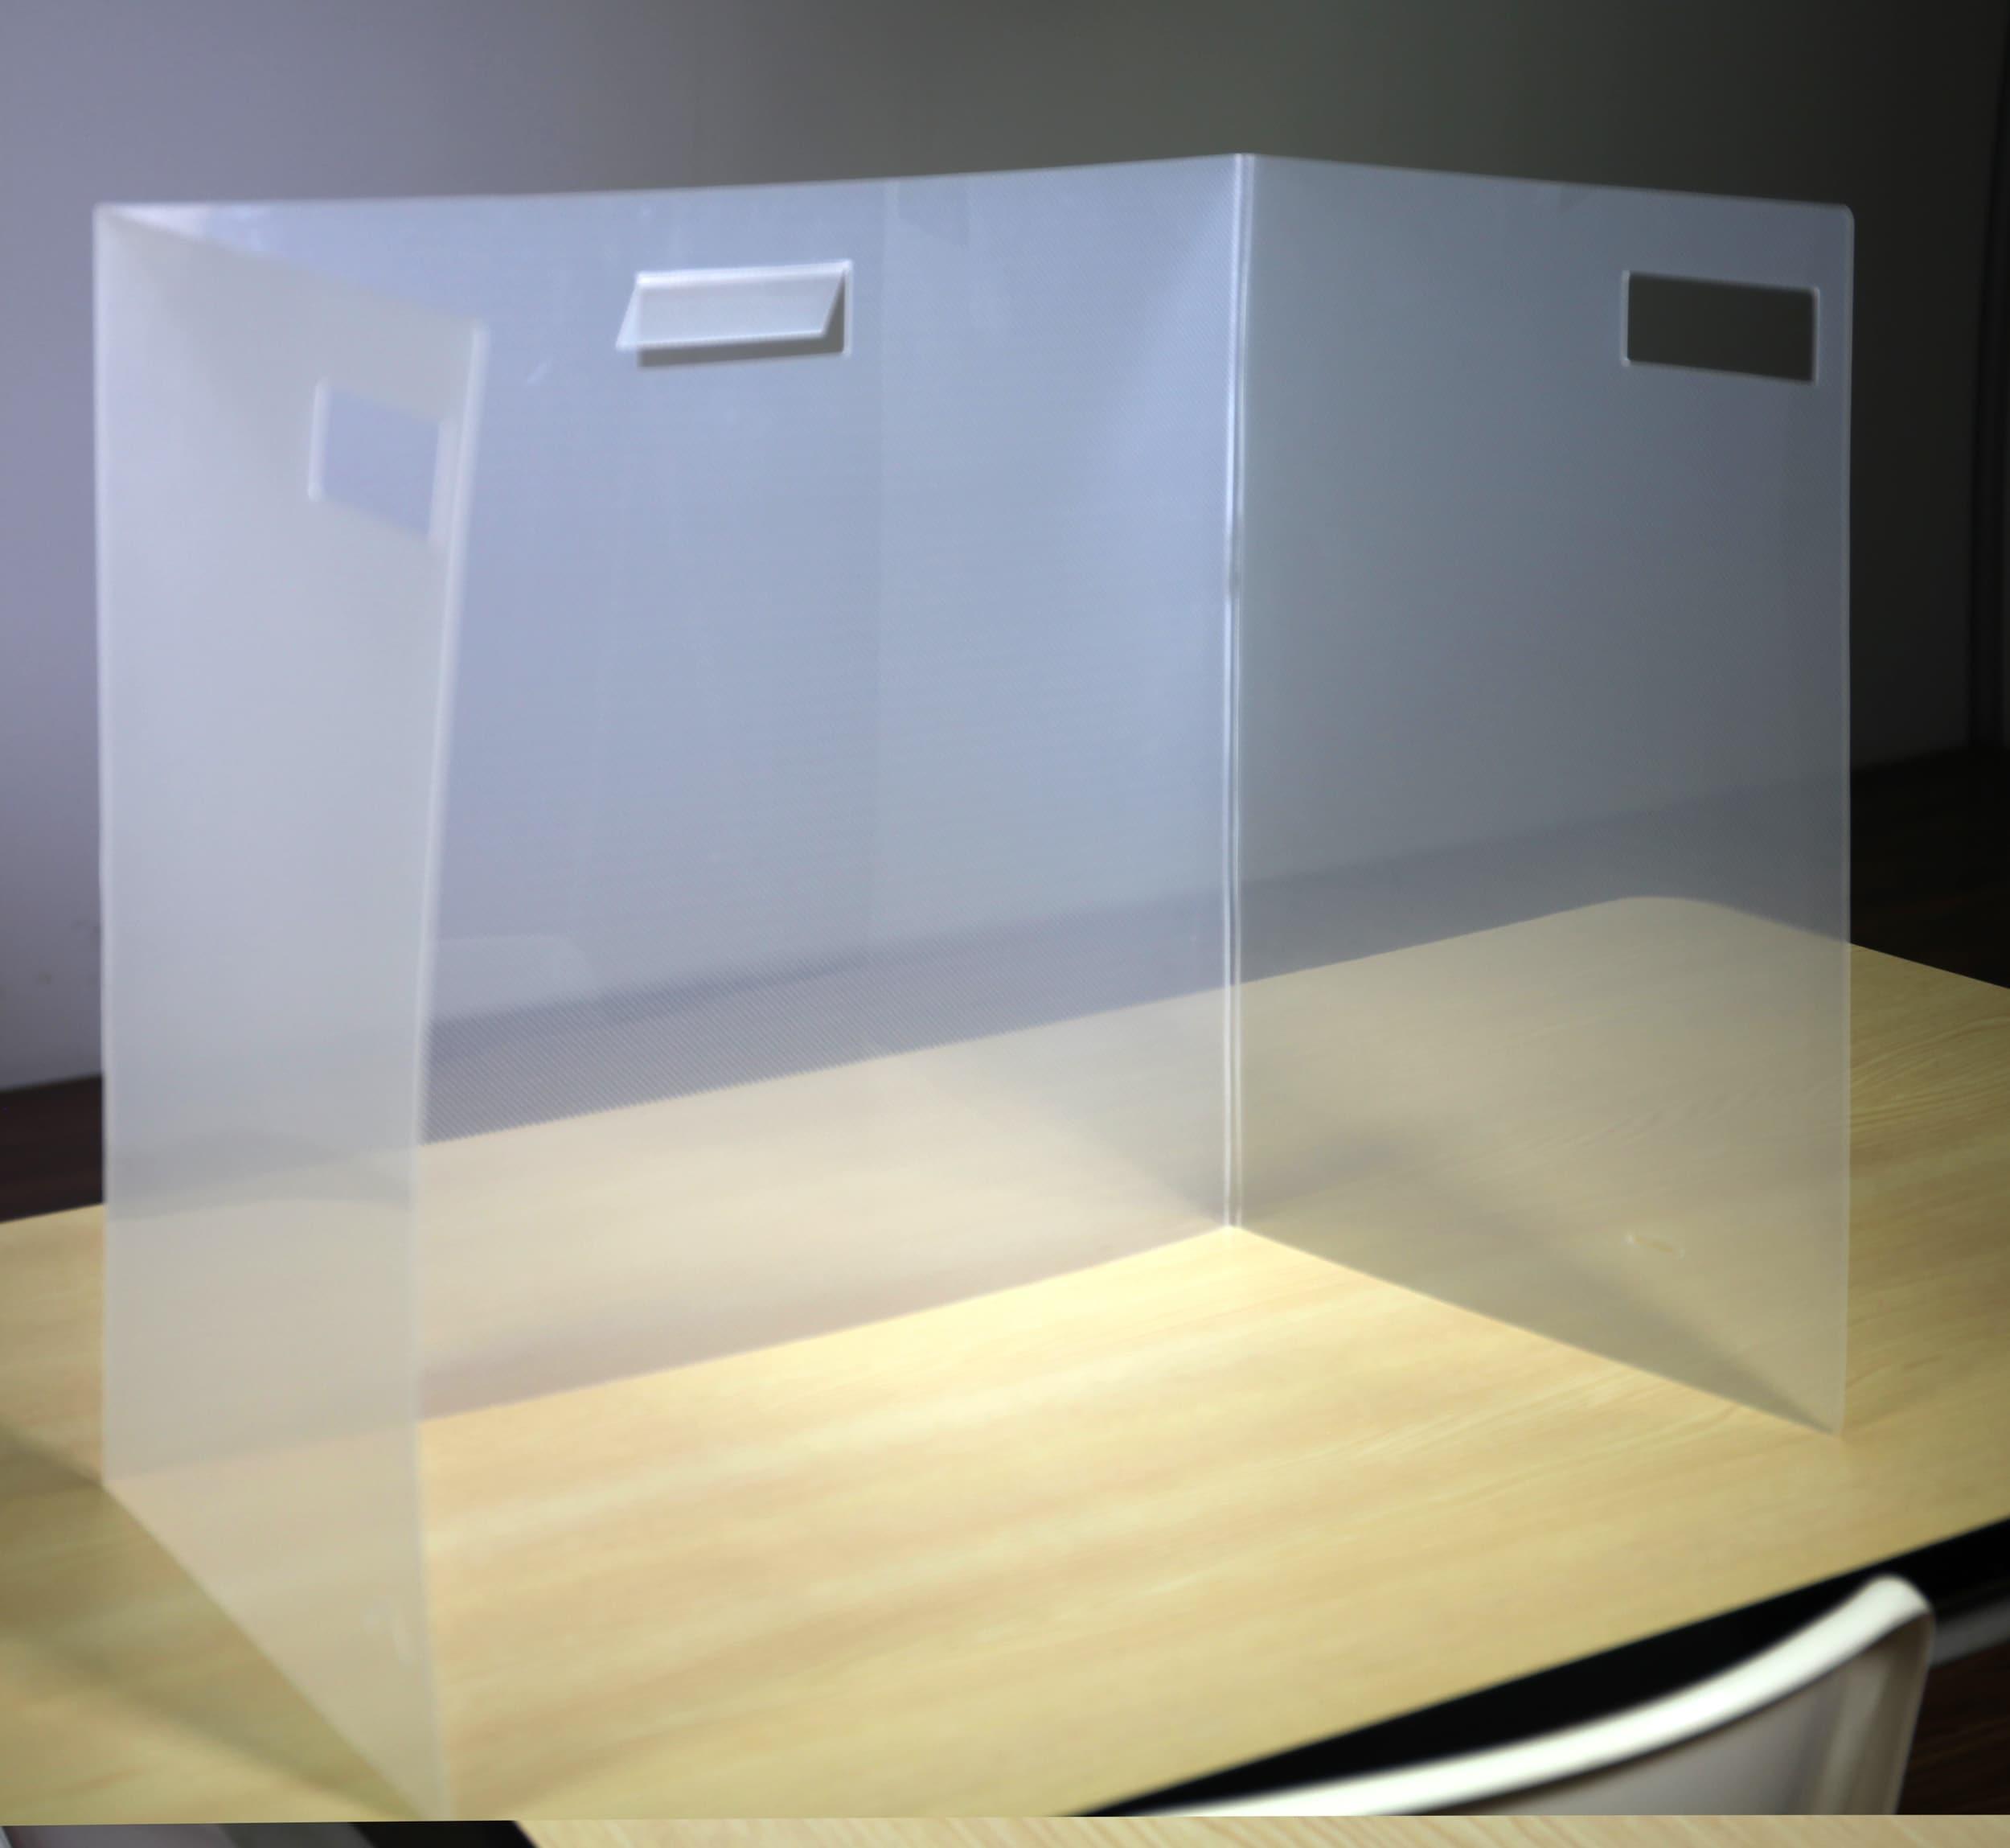 school desktop classroom dividing walls sneeze guard acrylic barrie coronavirus covid-19 disease prevention